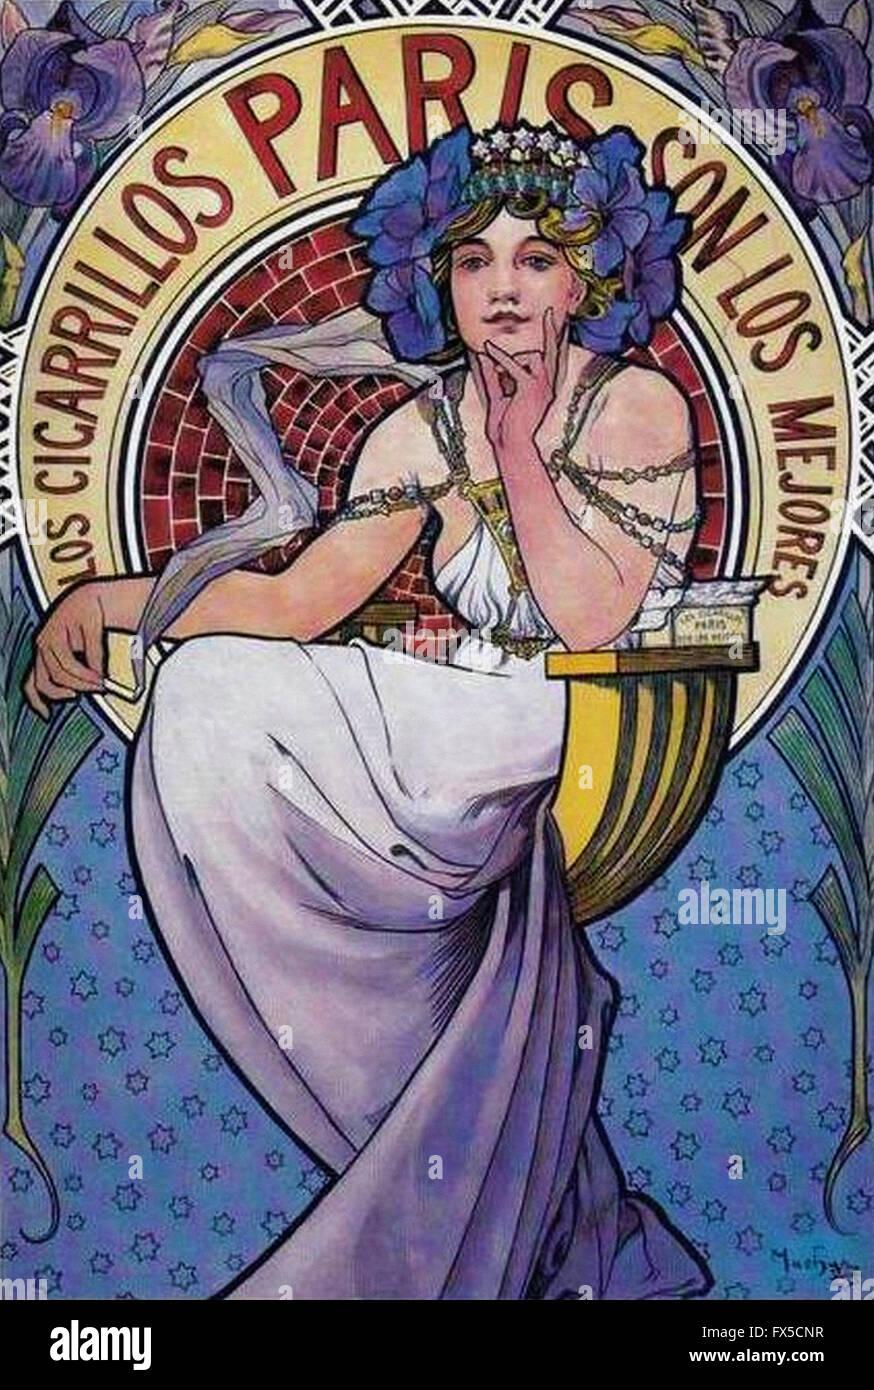 Alfons Mucha - Cigares Parigi Immagini Stock